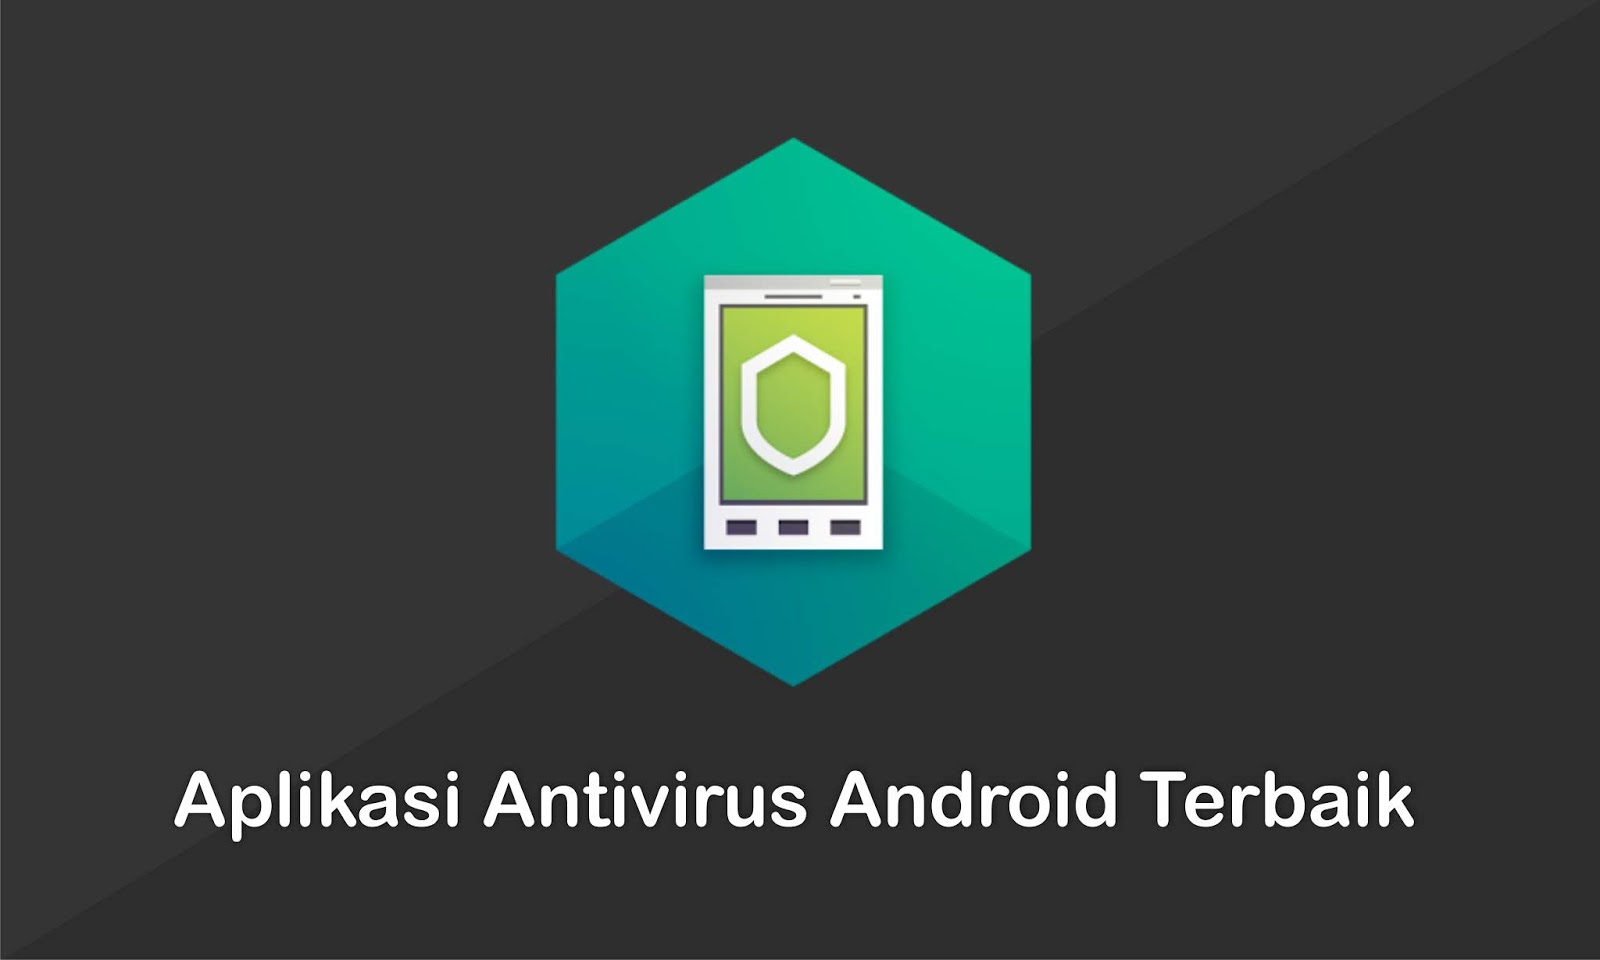 Daftar Aplikasi Antivirus Terbaik untuk Hp Android Anda